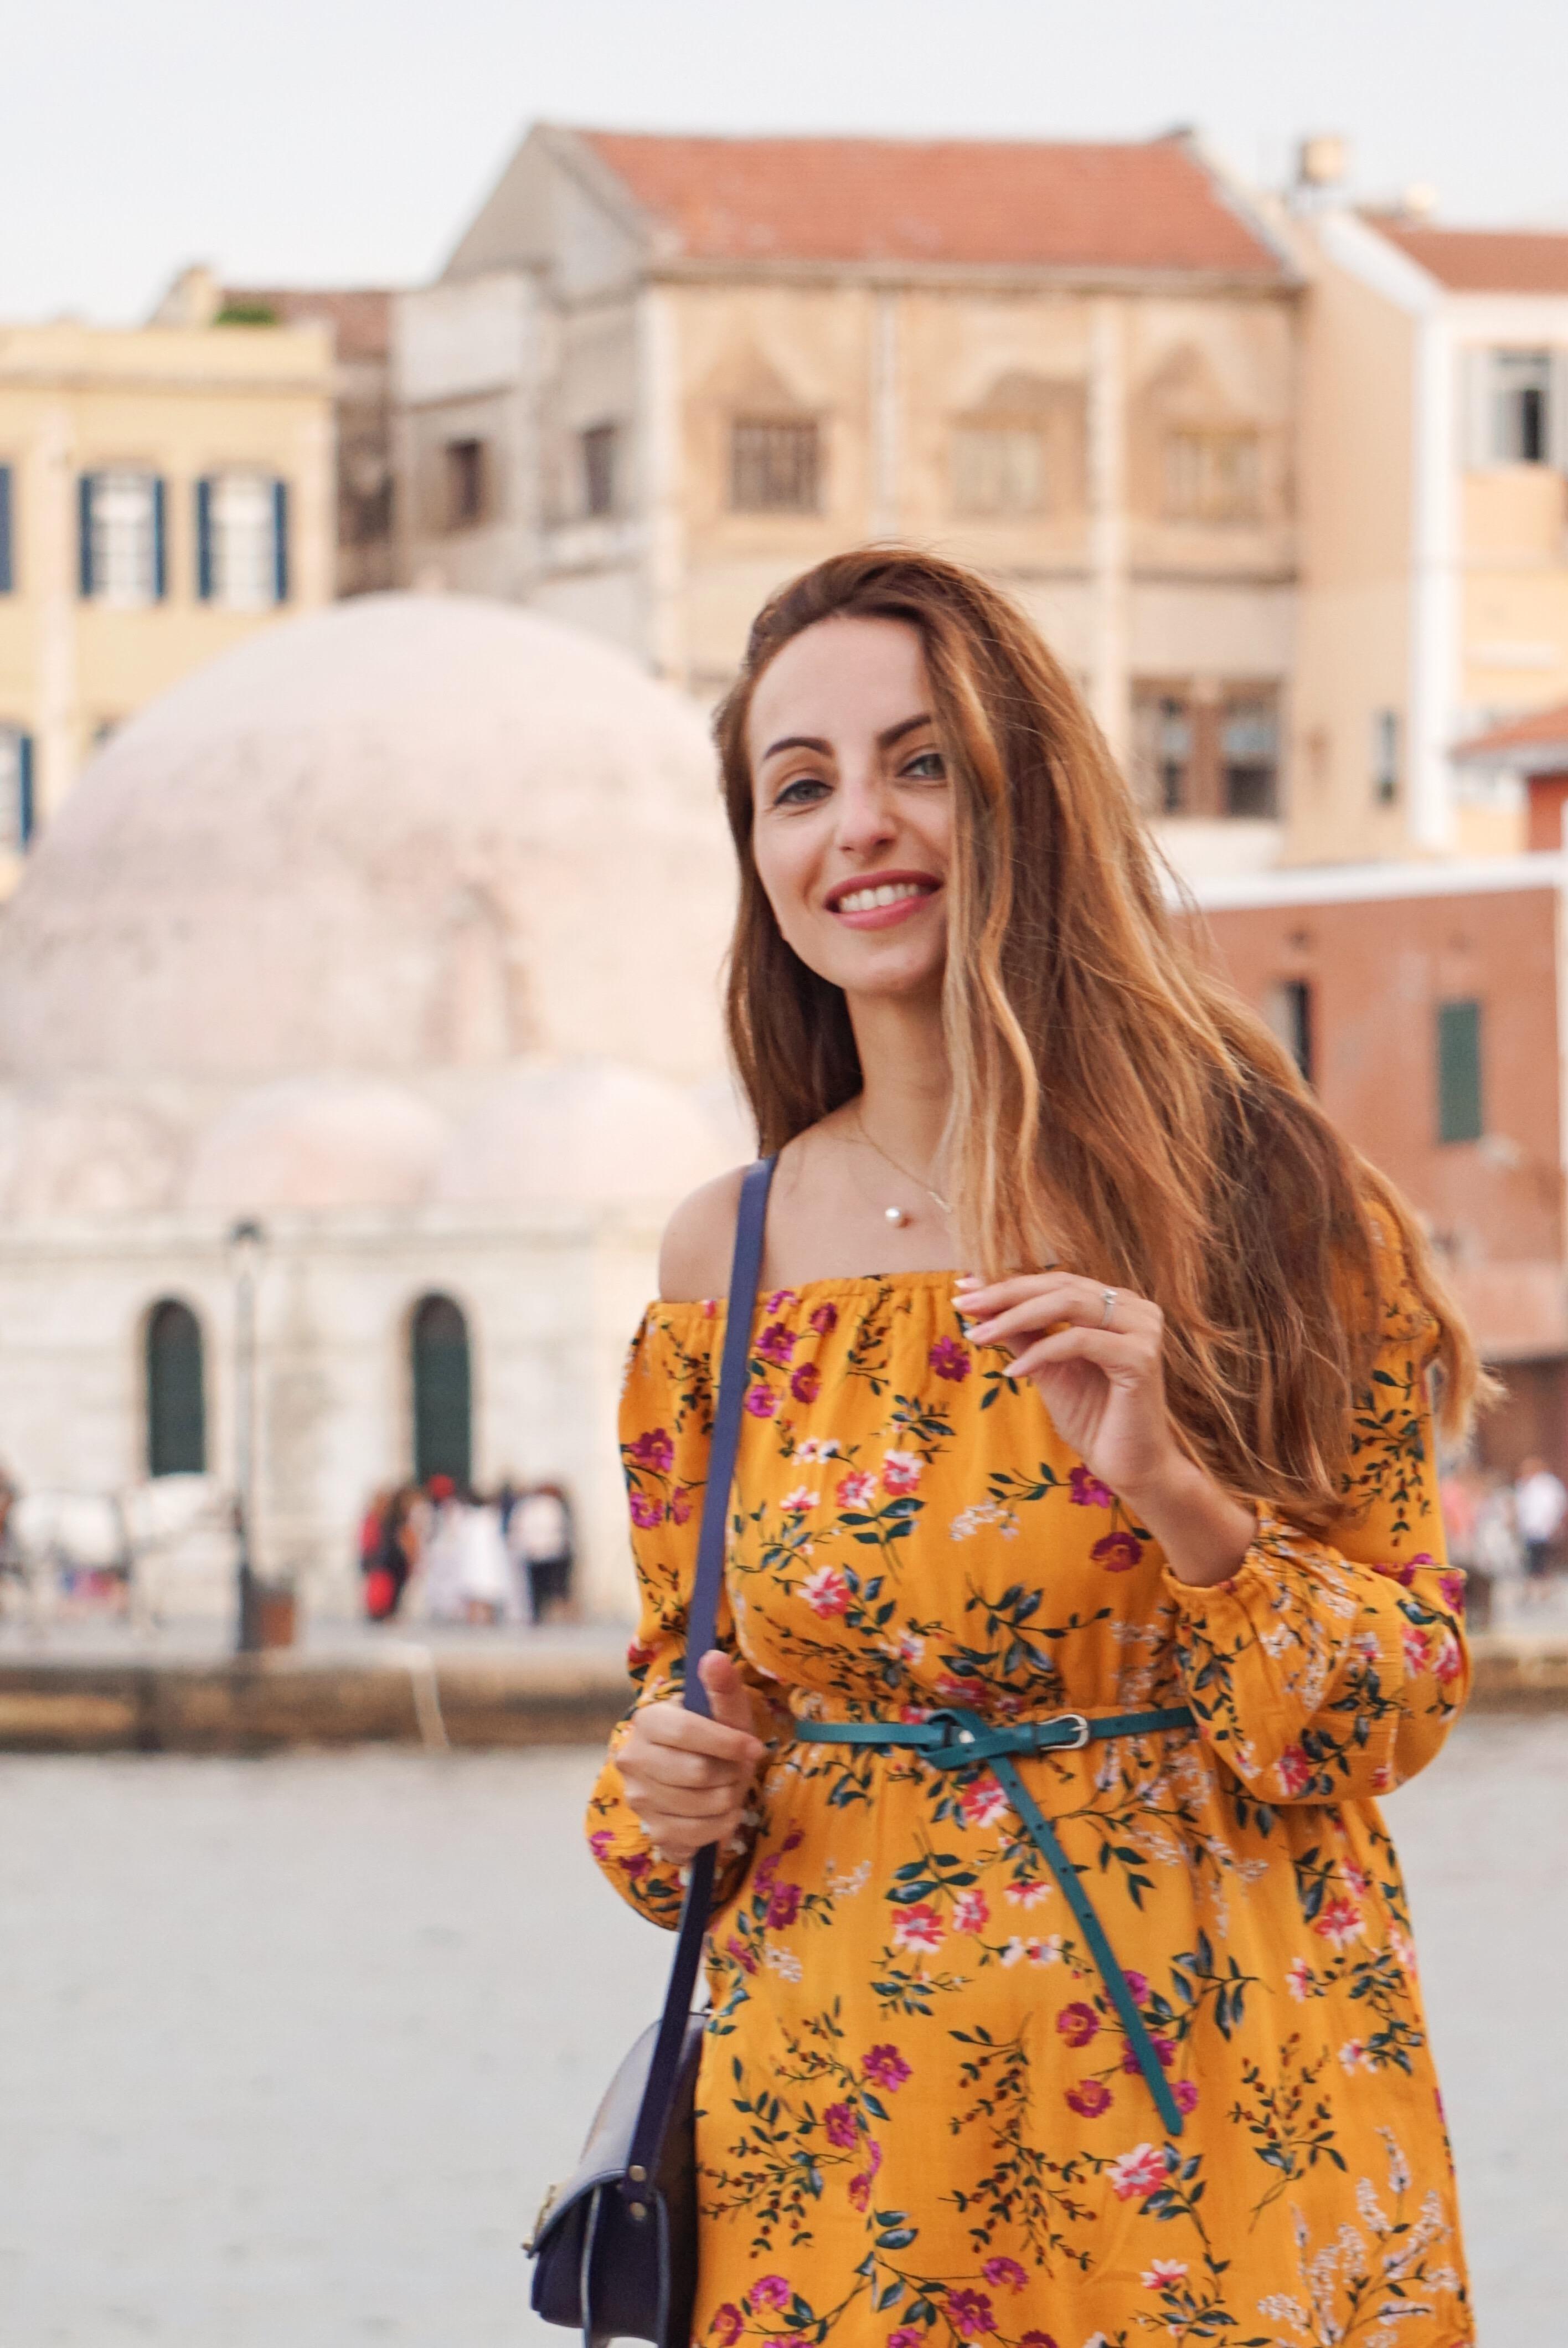 Chania-Crete-Fashionblogger-Outfit-Post-4